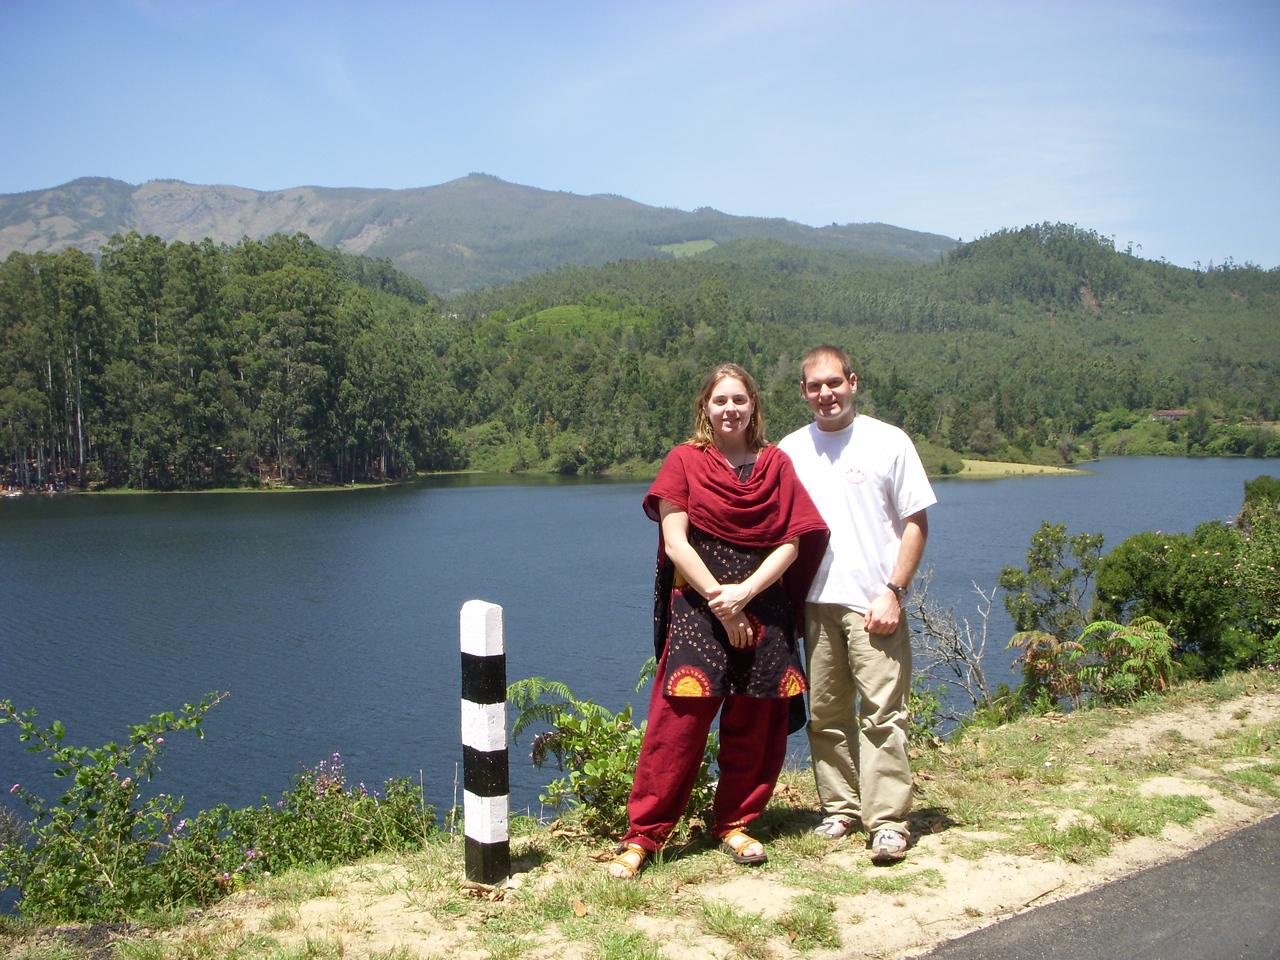 Cheryl and Jon next to a lake near Munnar